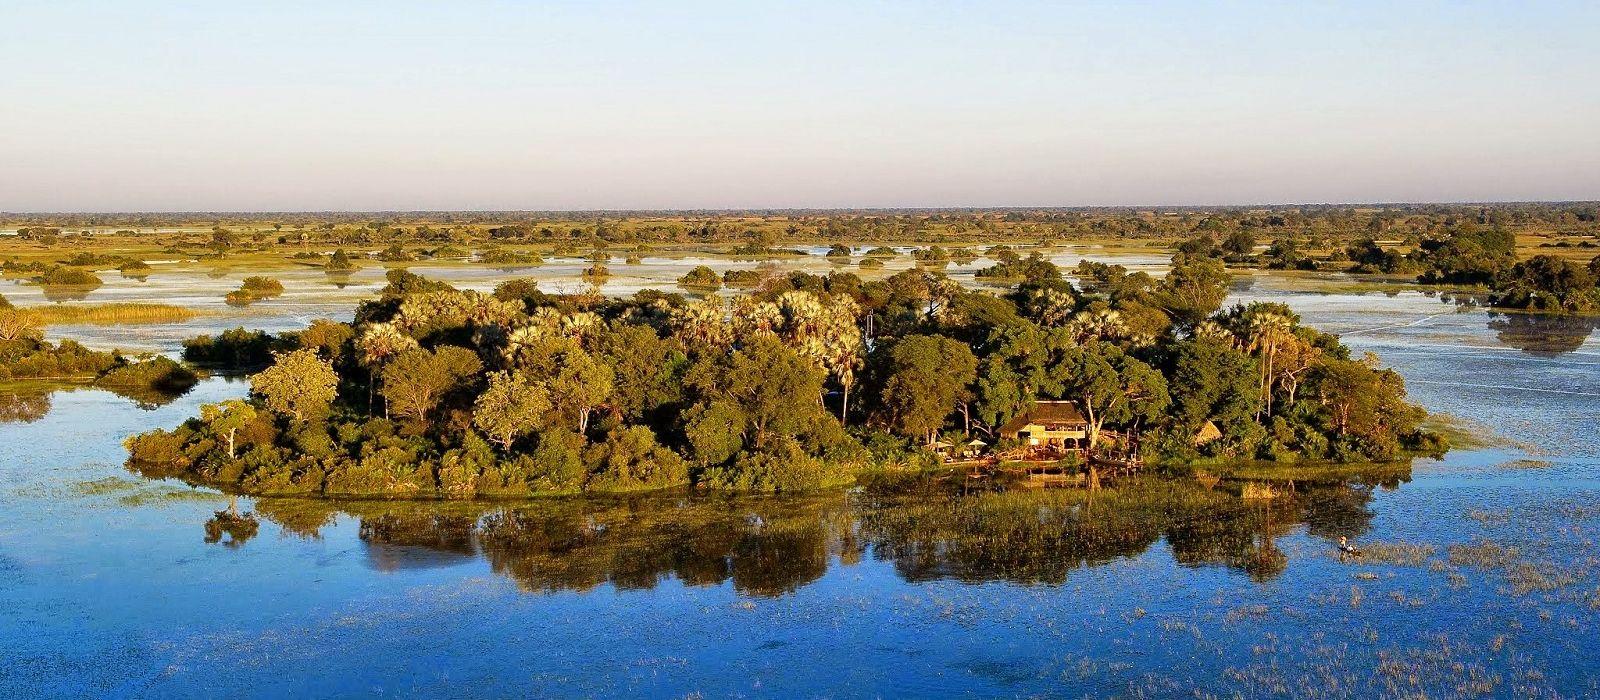 Südafrika, Simbabwe & Botswana: Wilde Tiere & glitzernde Gewässer Urlaub 1